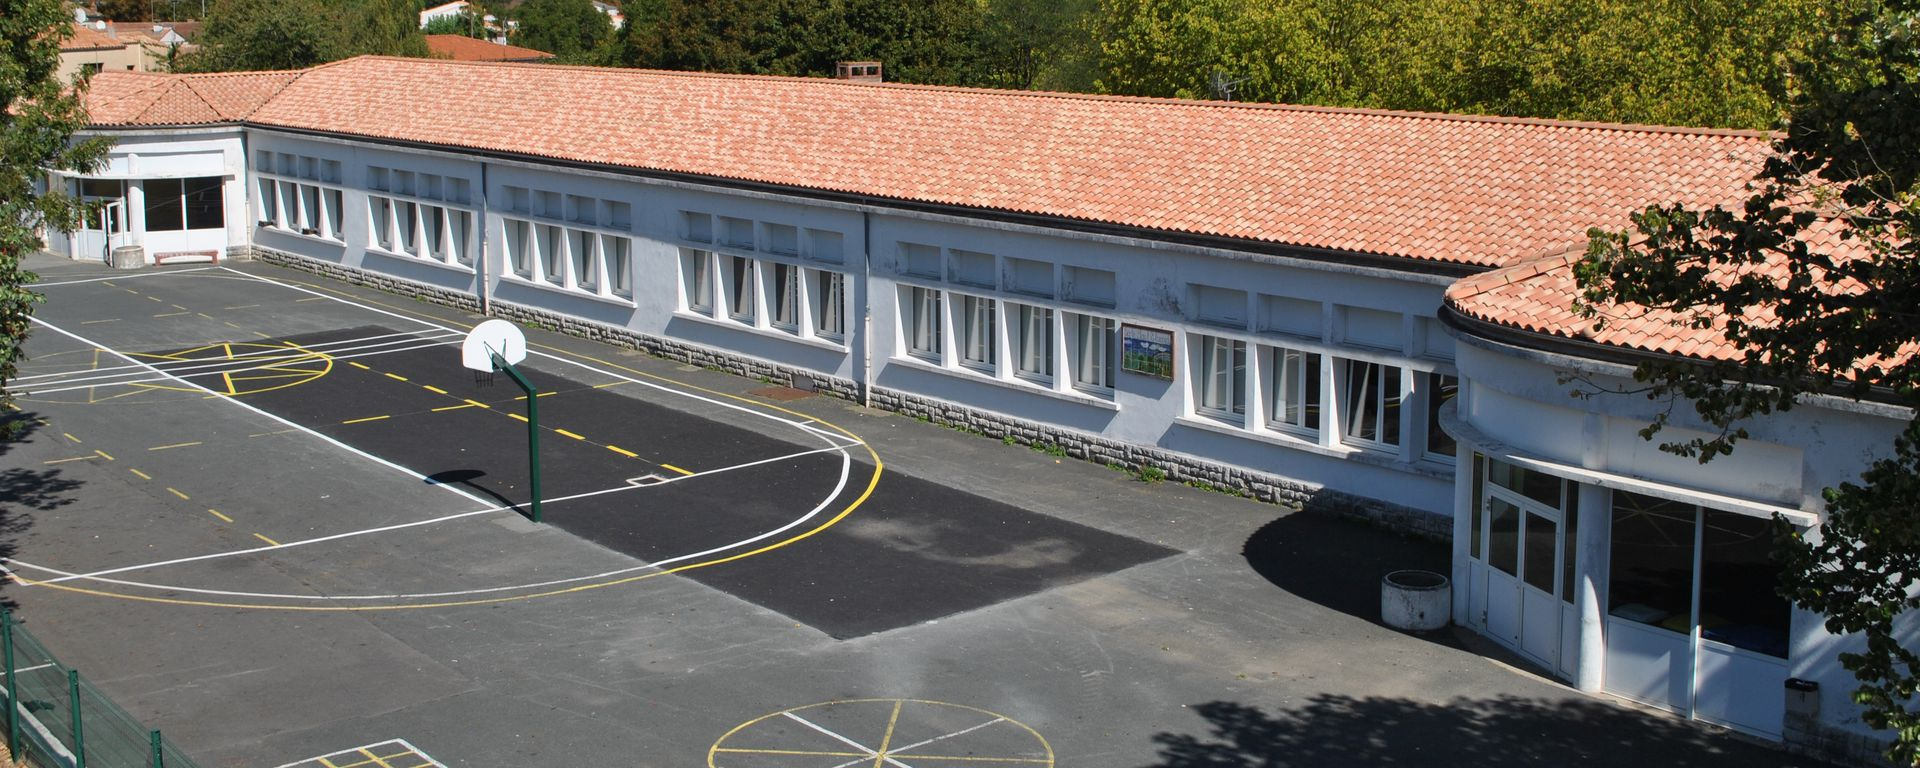 Ecole Paul Eluard - © Mairie de Dompierre sur Mer